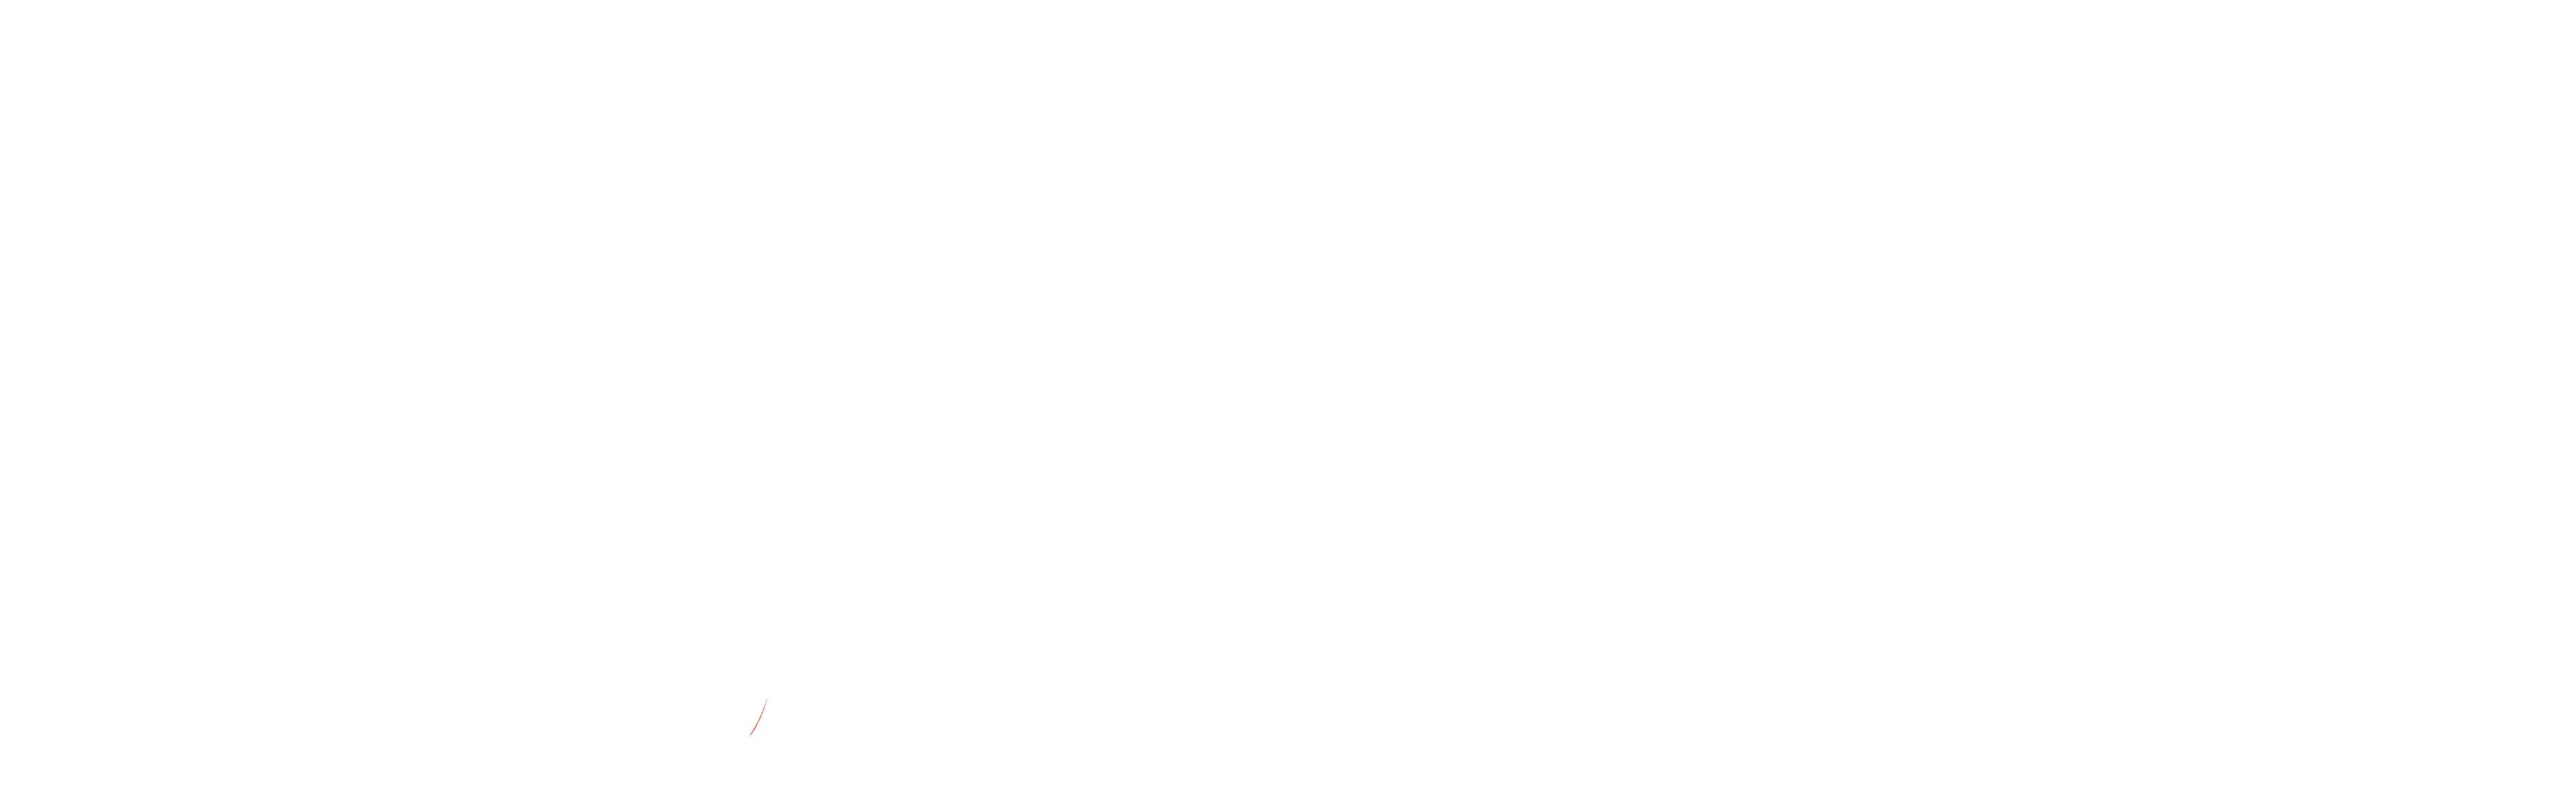 WeTranslate logo white